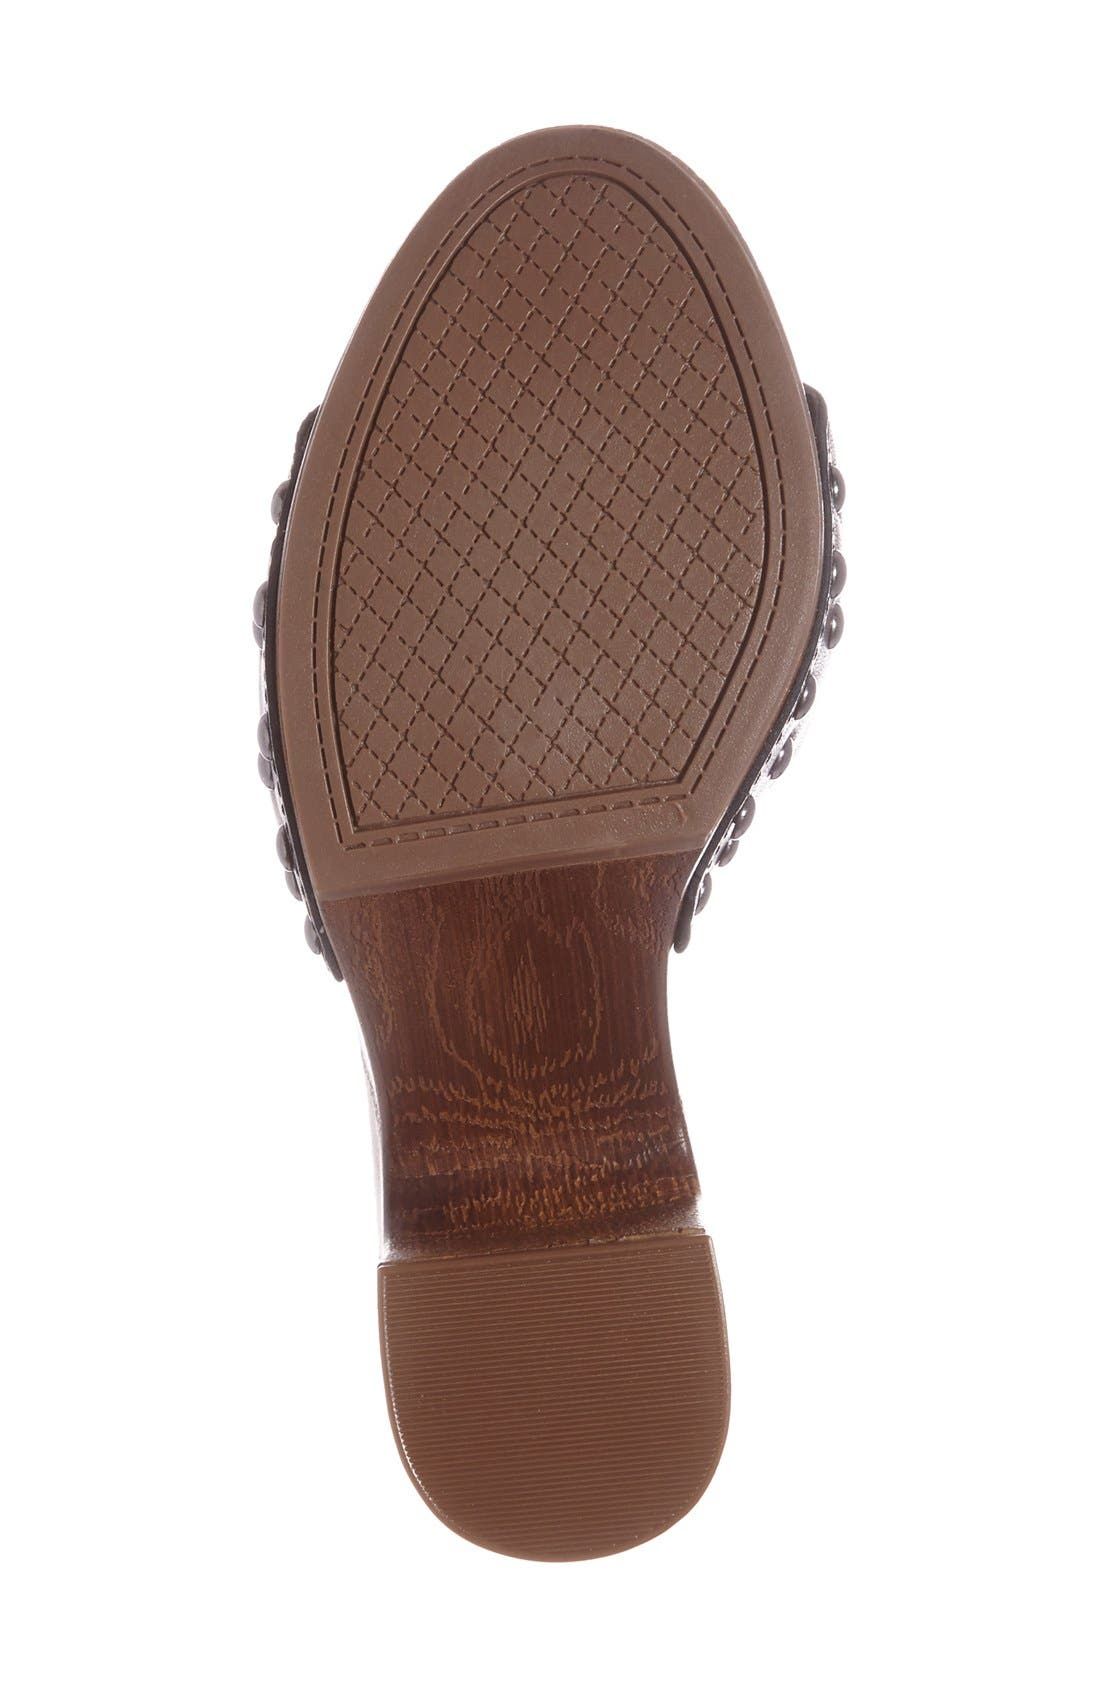 'Karema' Clog Platform Sandal,                             Alternate thumbnail 4, color,                             001